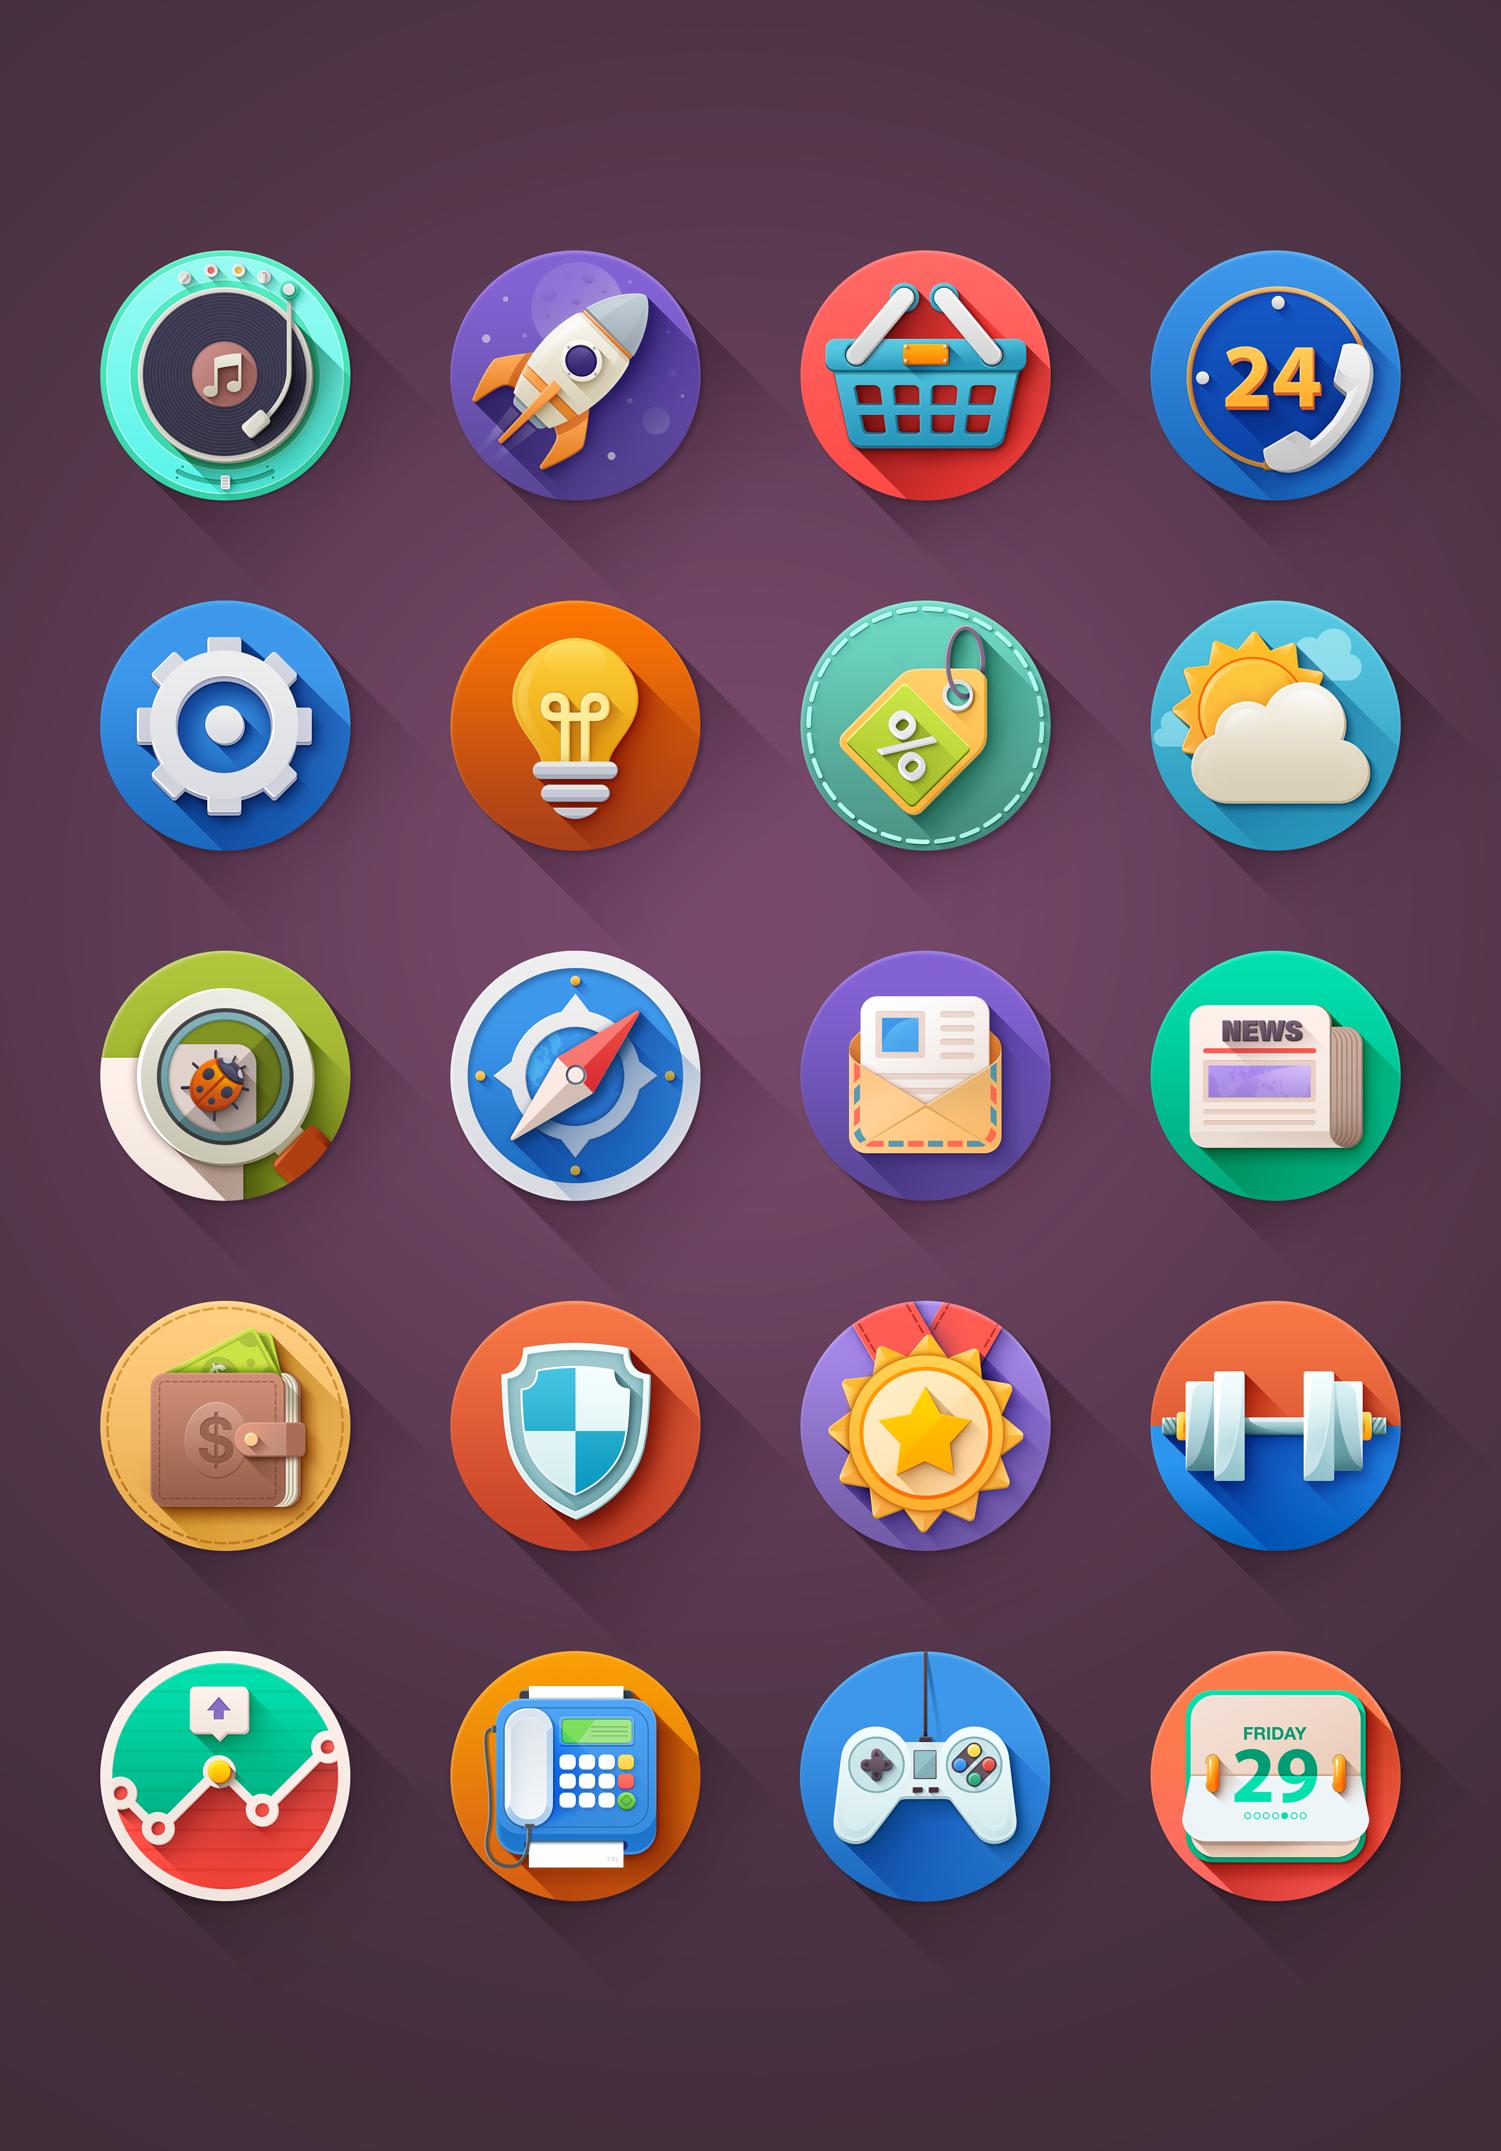 Awesome Icons!!! icons flatdesign 앱 아이콘, 아이콘, 아이콘 모음